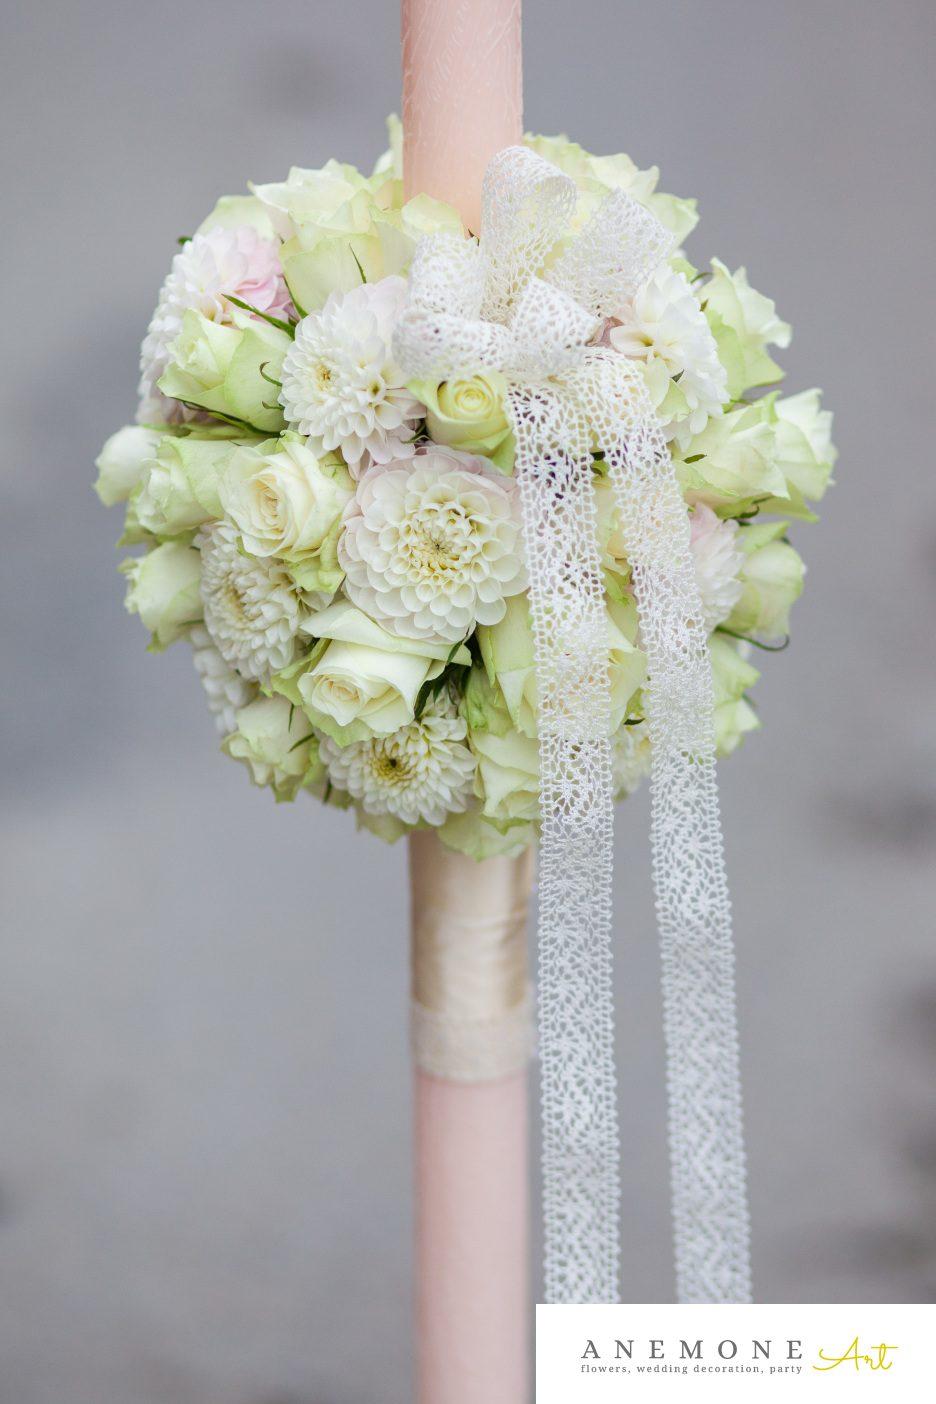 Poza, foto cu Flori de nunta alb, crem, glob, lumanare cununie in Arad, Timisoara, Oradea (wedding flowers, bouquets) nunta Arad, Timisoara, Oradea